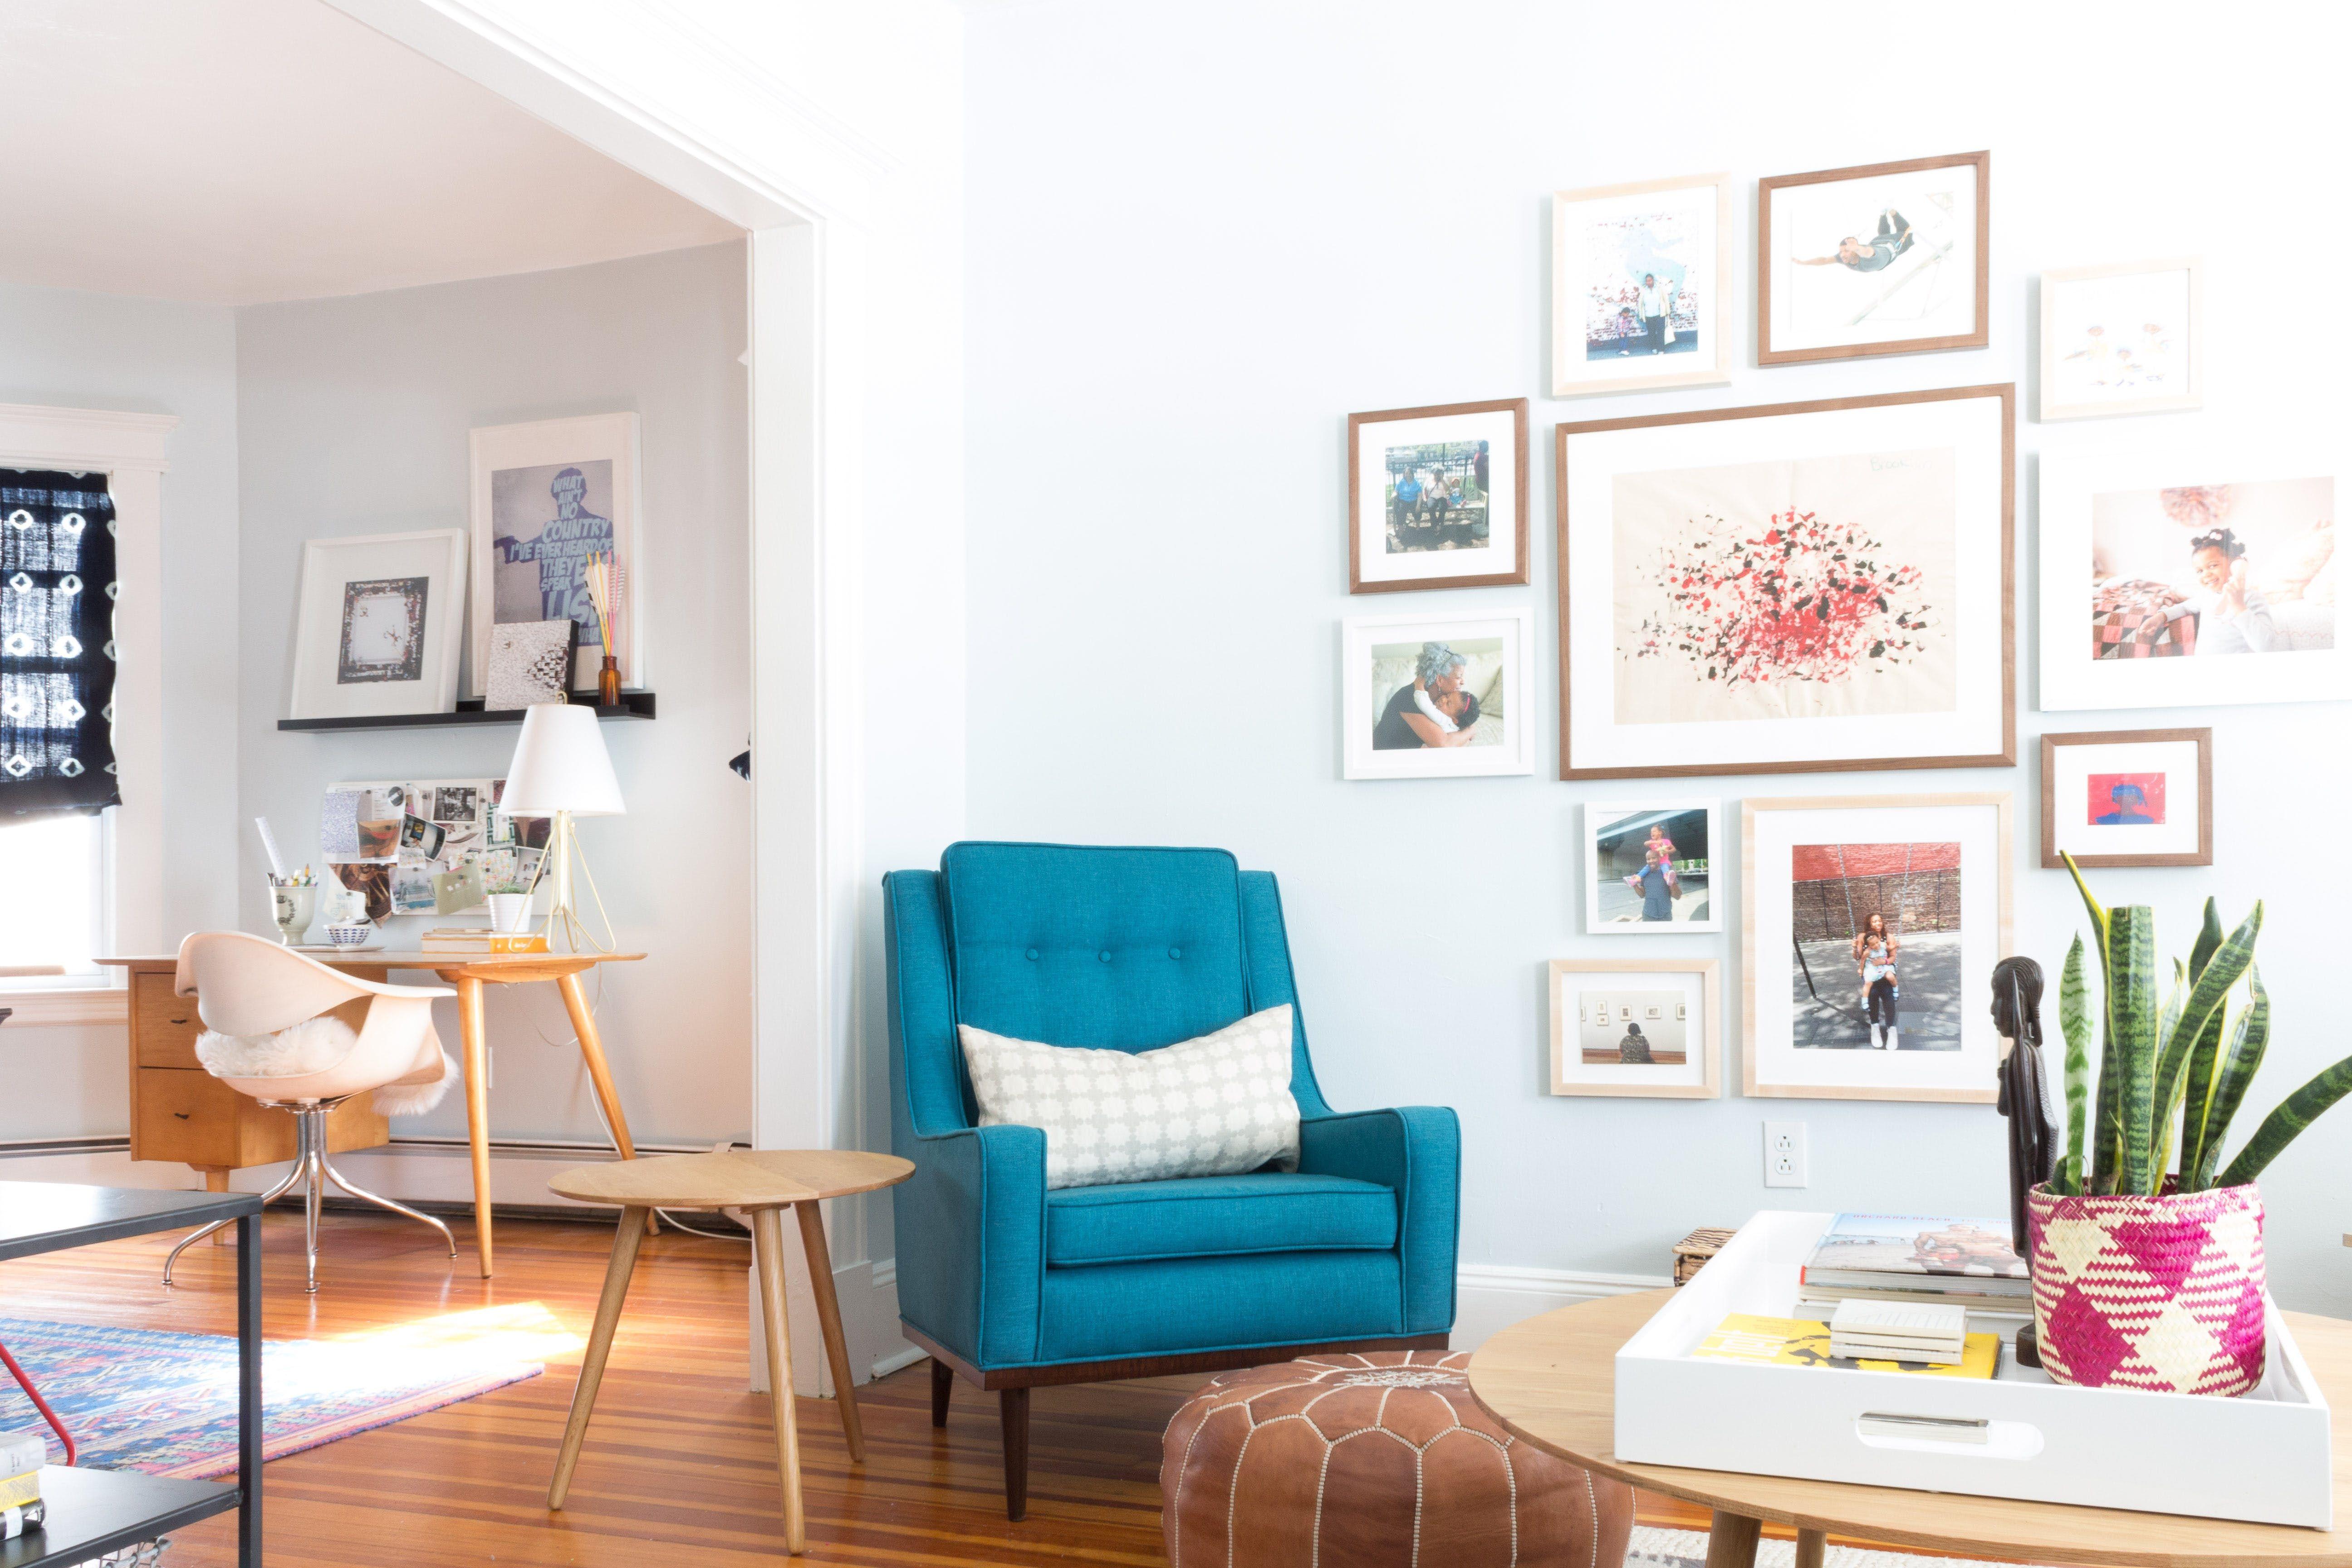 Home interior wall design tour a designerus creative u colorful connecticut home  gallery